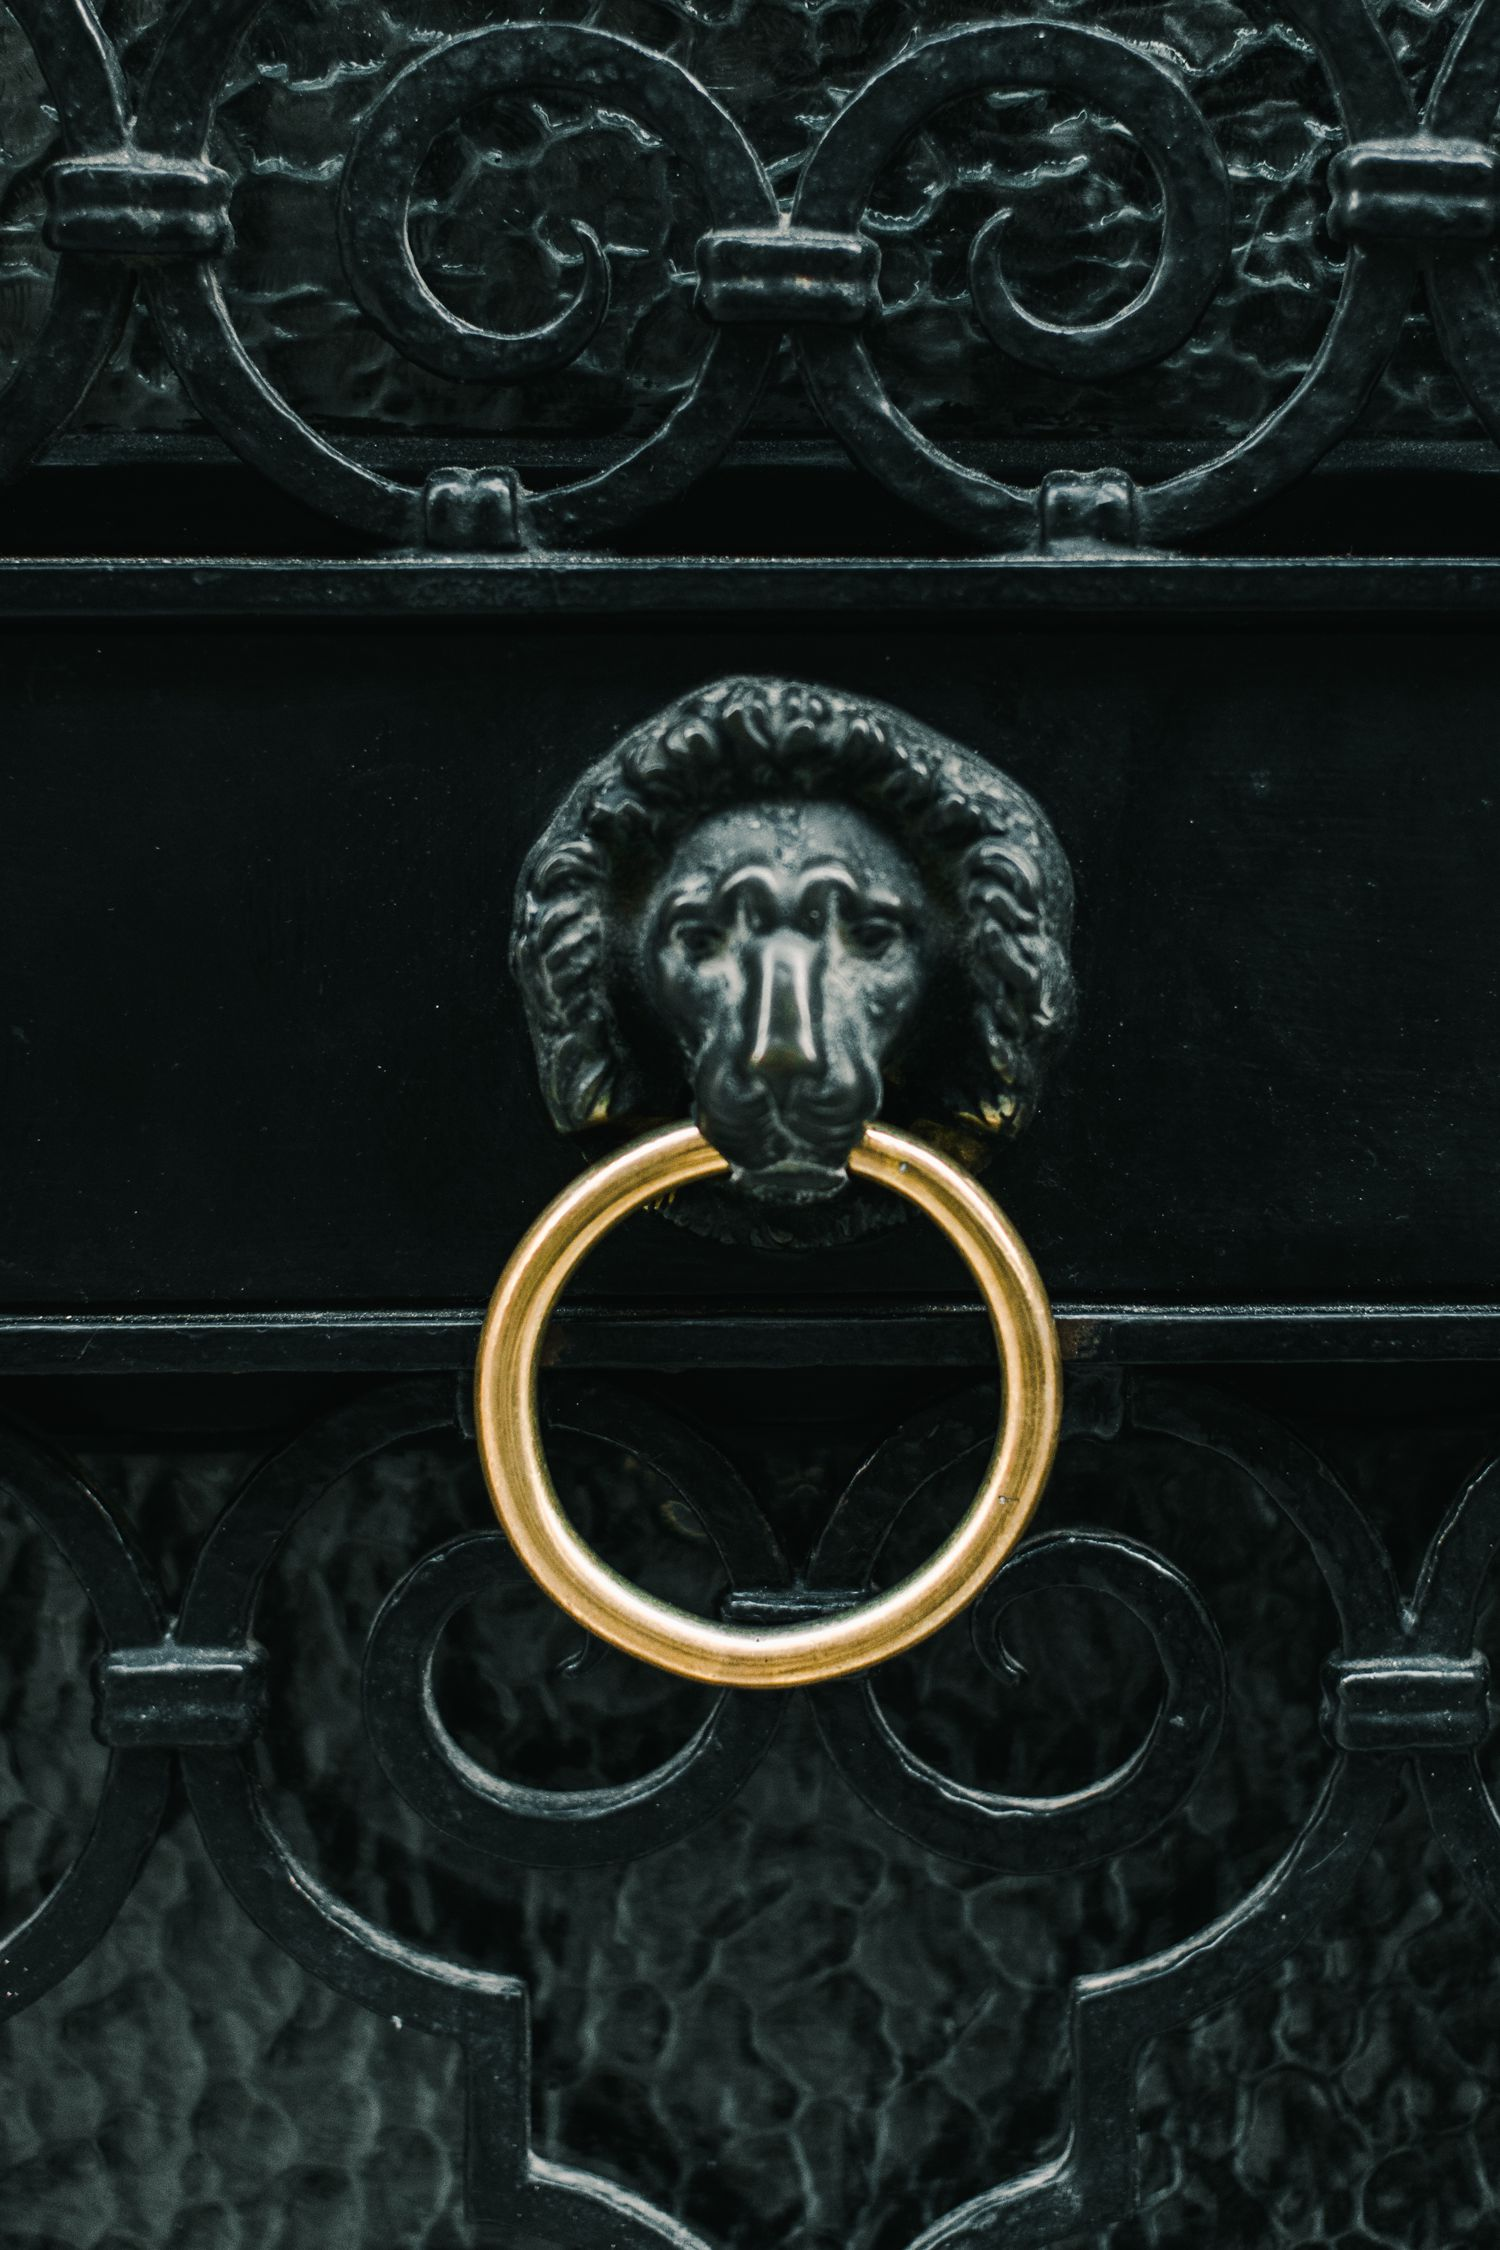 Fine-Art-Hochzeitsfotografie-Hochzeitsfotograf-Venedig-Venice-Toskana-Italien-Fine-Art-Wedding-Photography-Italy_2624